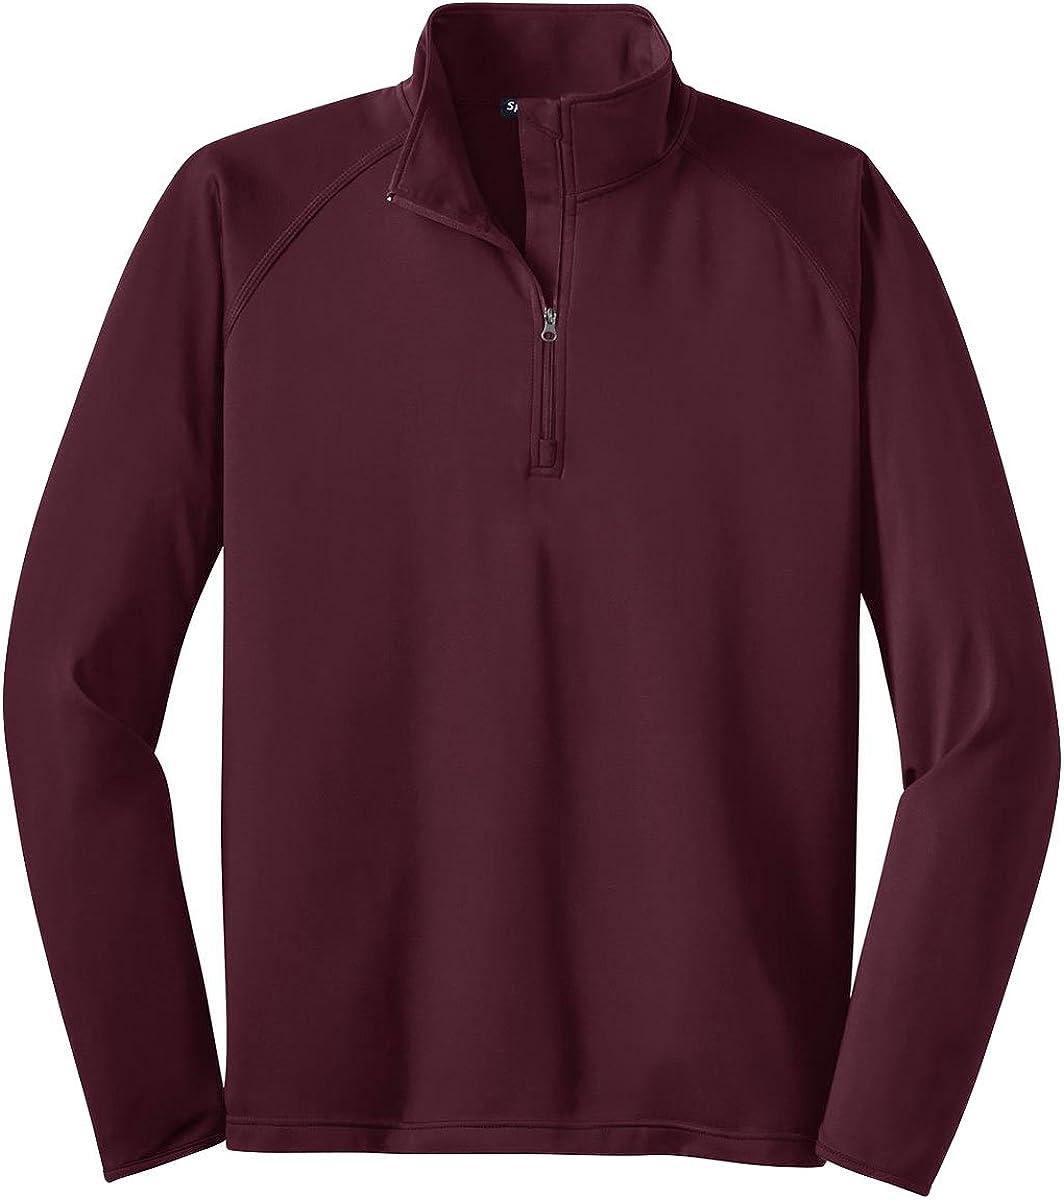 Sport-Tek Stretch 1/2-Zip Pullover, Maroon